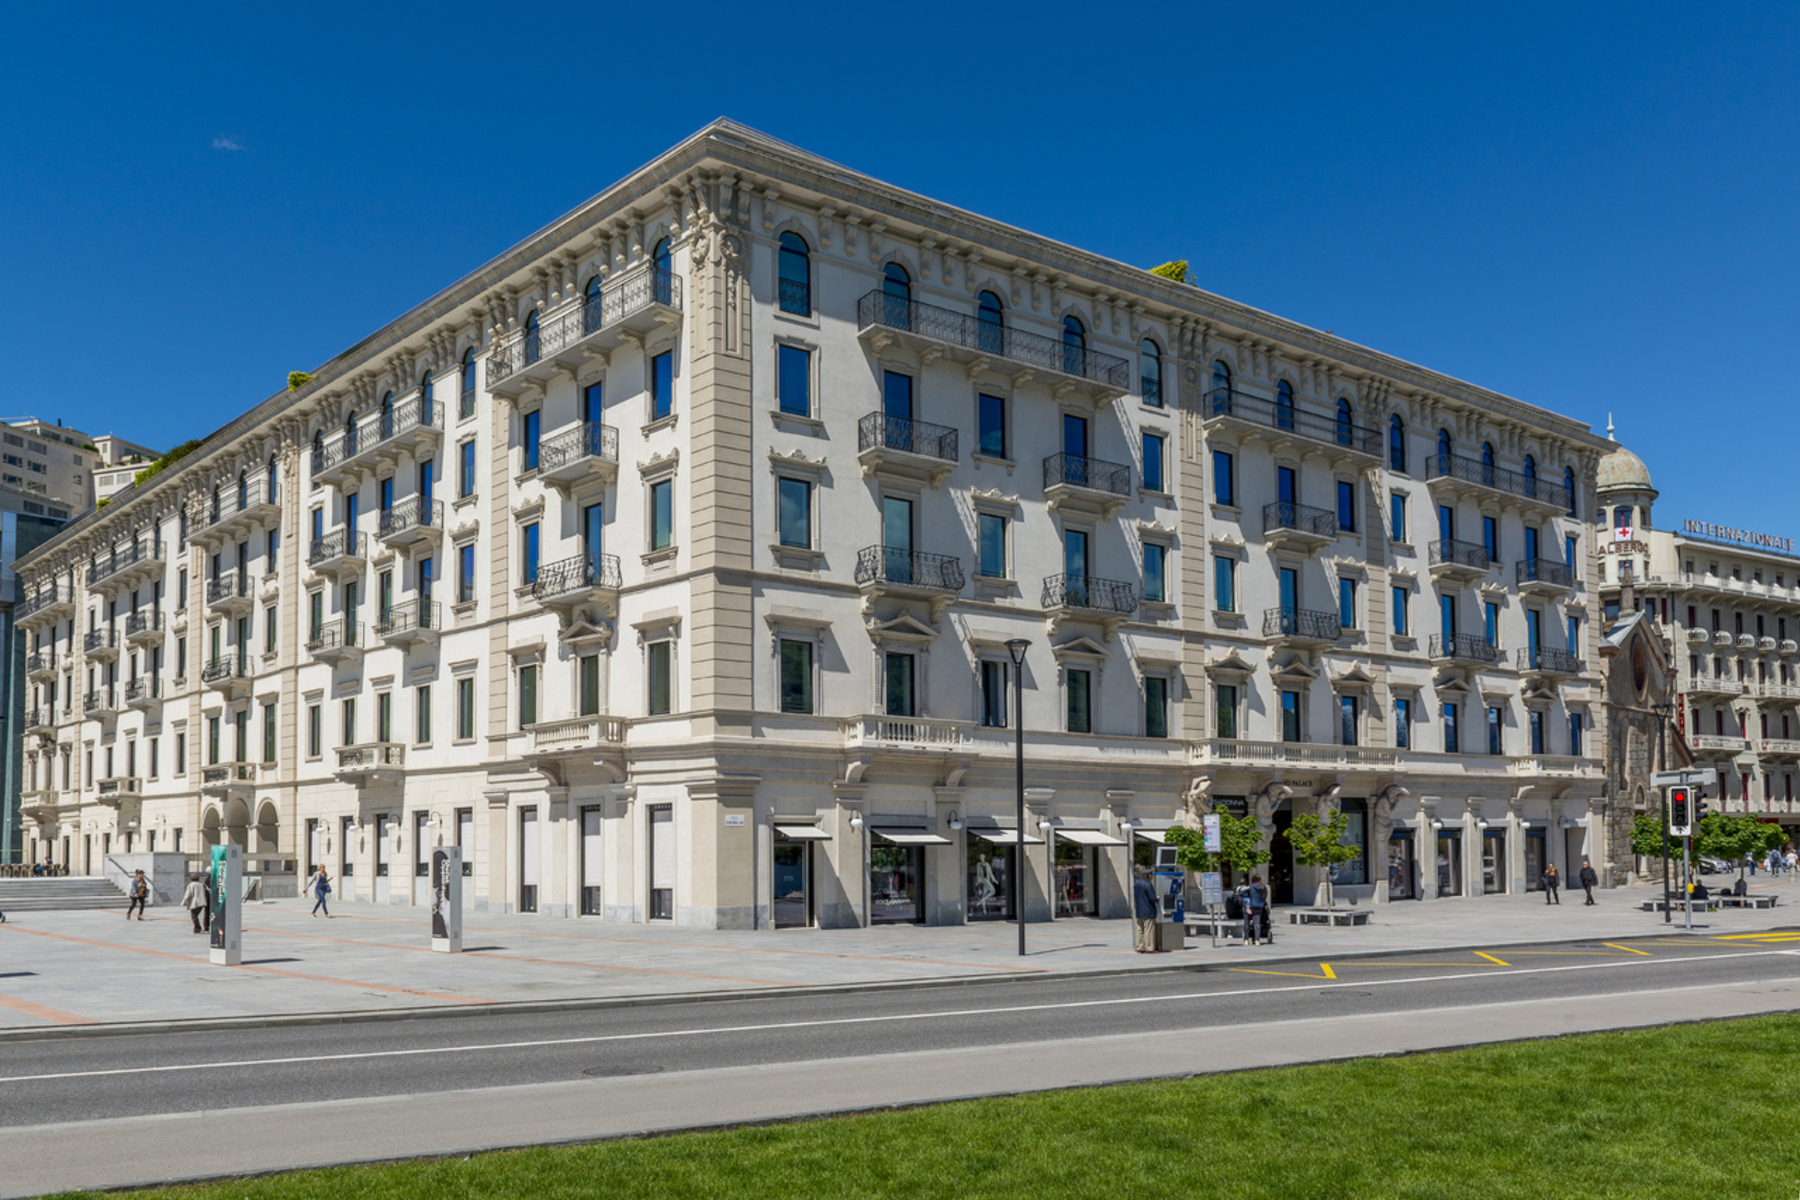 Apartment for Sale at Grand Palace - exclusive lakefront apartment Lugano, Lugano, Ticino, 6900 Switzerland